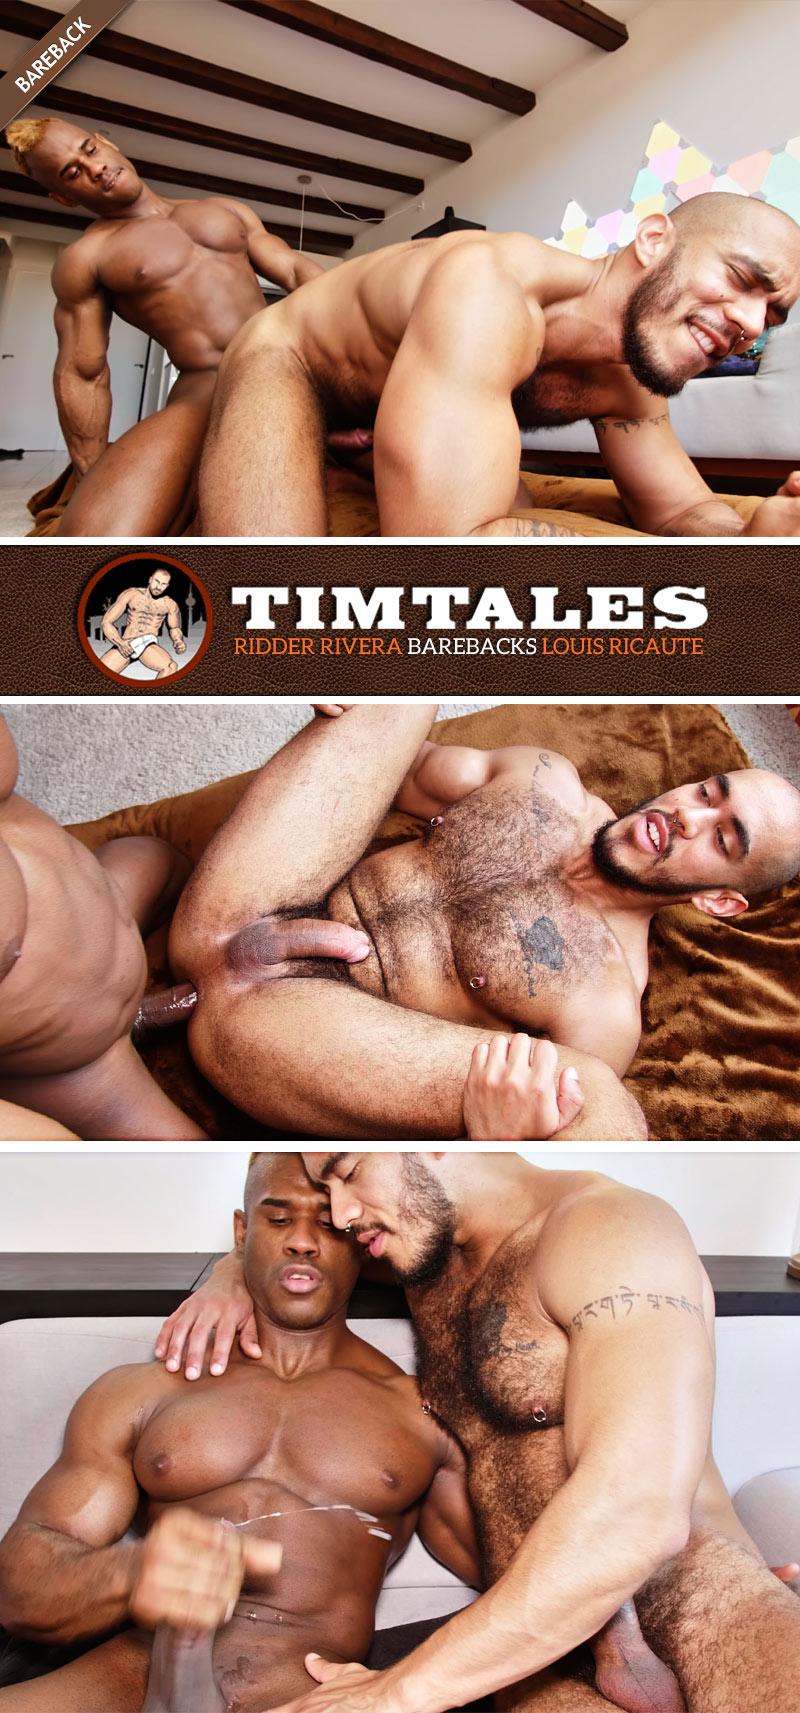 Ridder Rivera Barebacks Louis Ricaute at TimTales